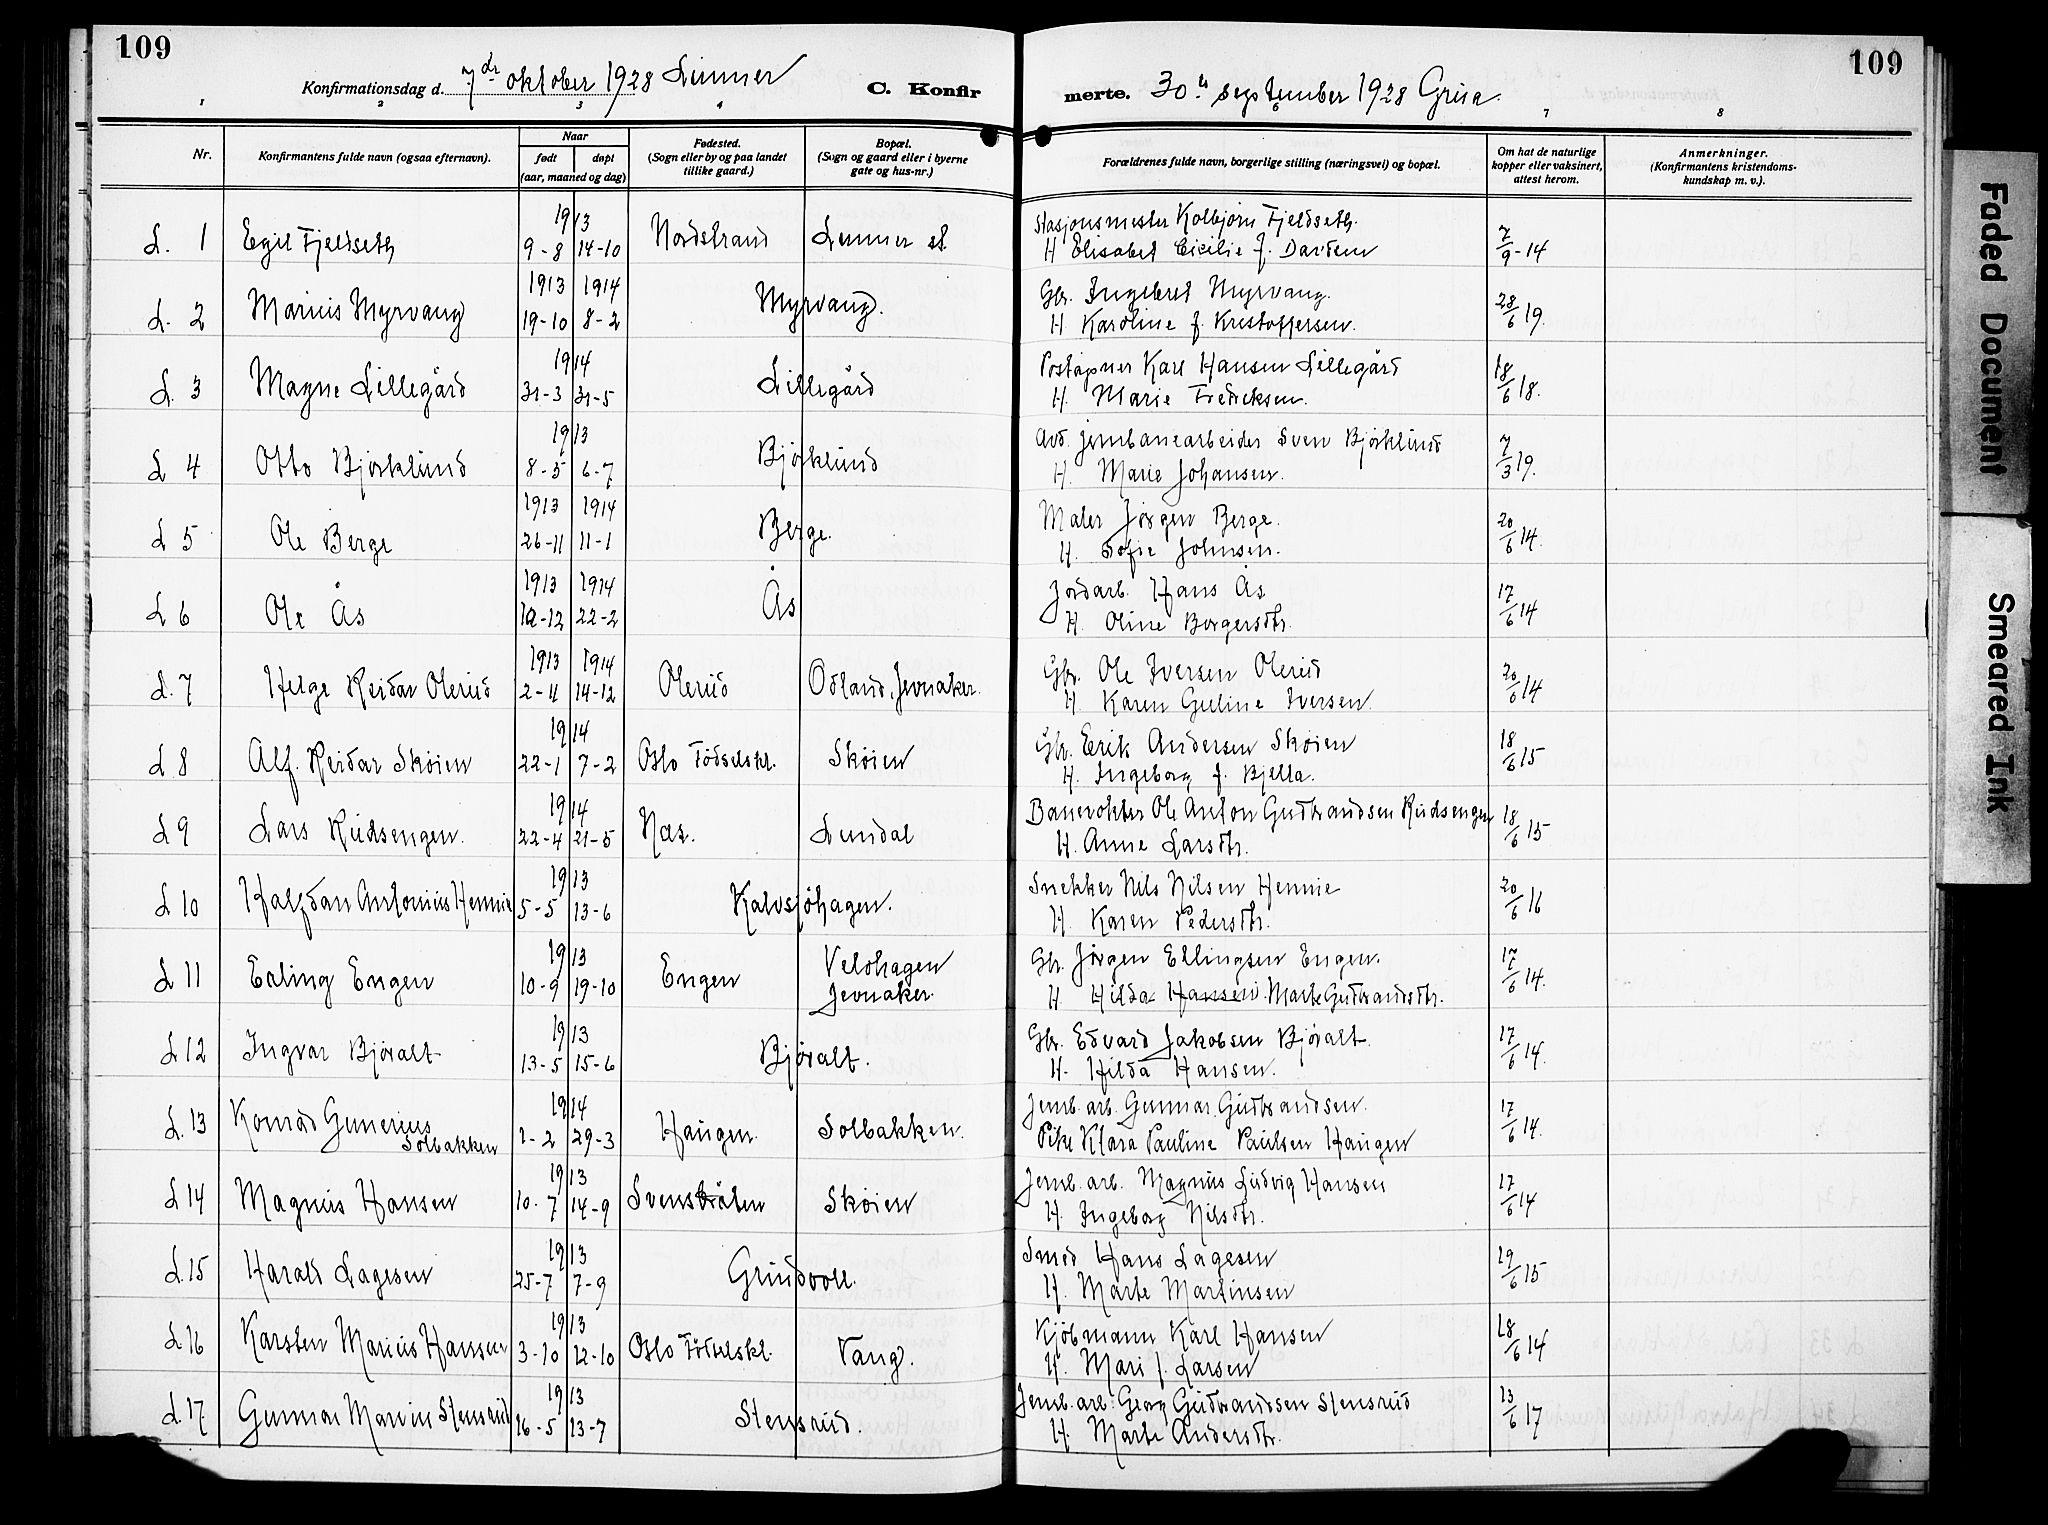 SAH, Lunner prestekontor, H/Ha/Hab/L0002: Klokkerbok nr. 2, 1923-1933, s. 109